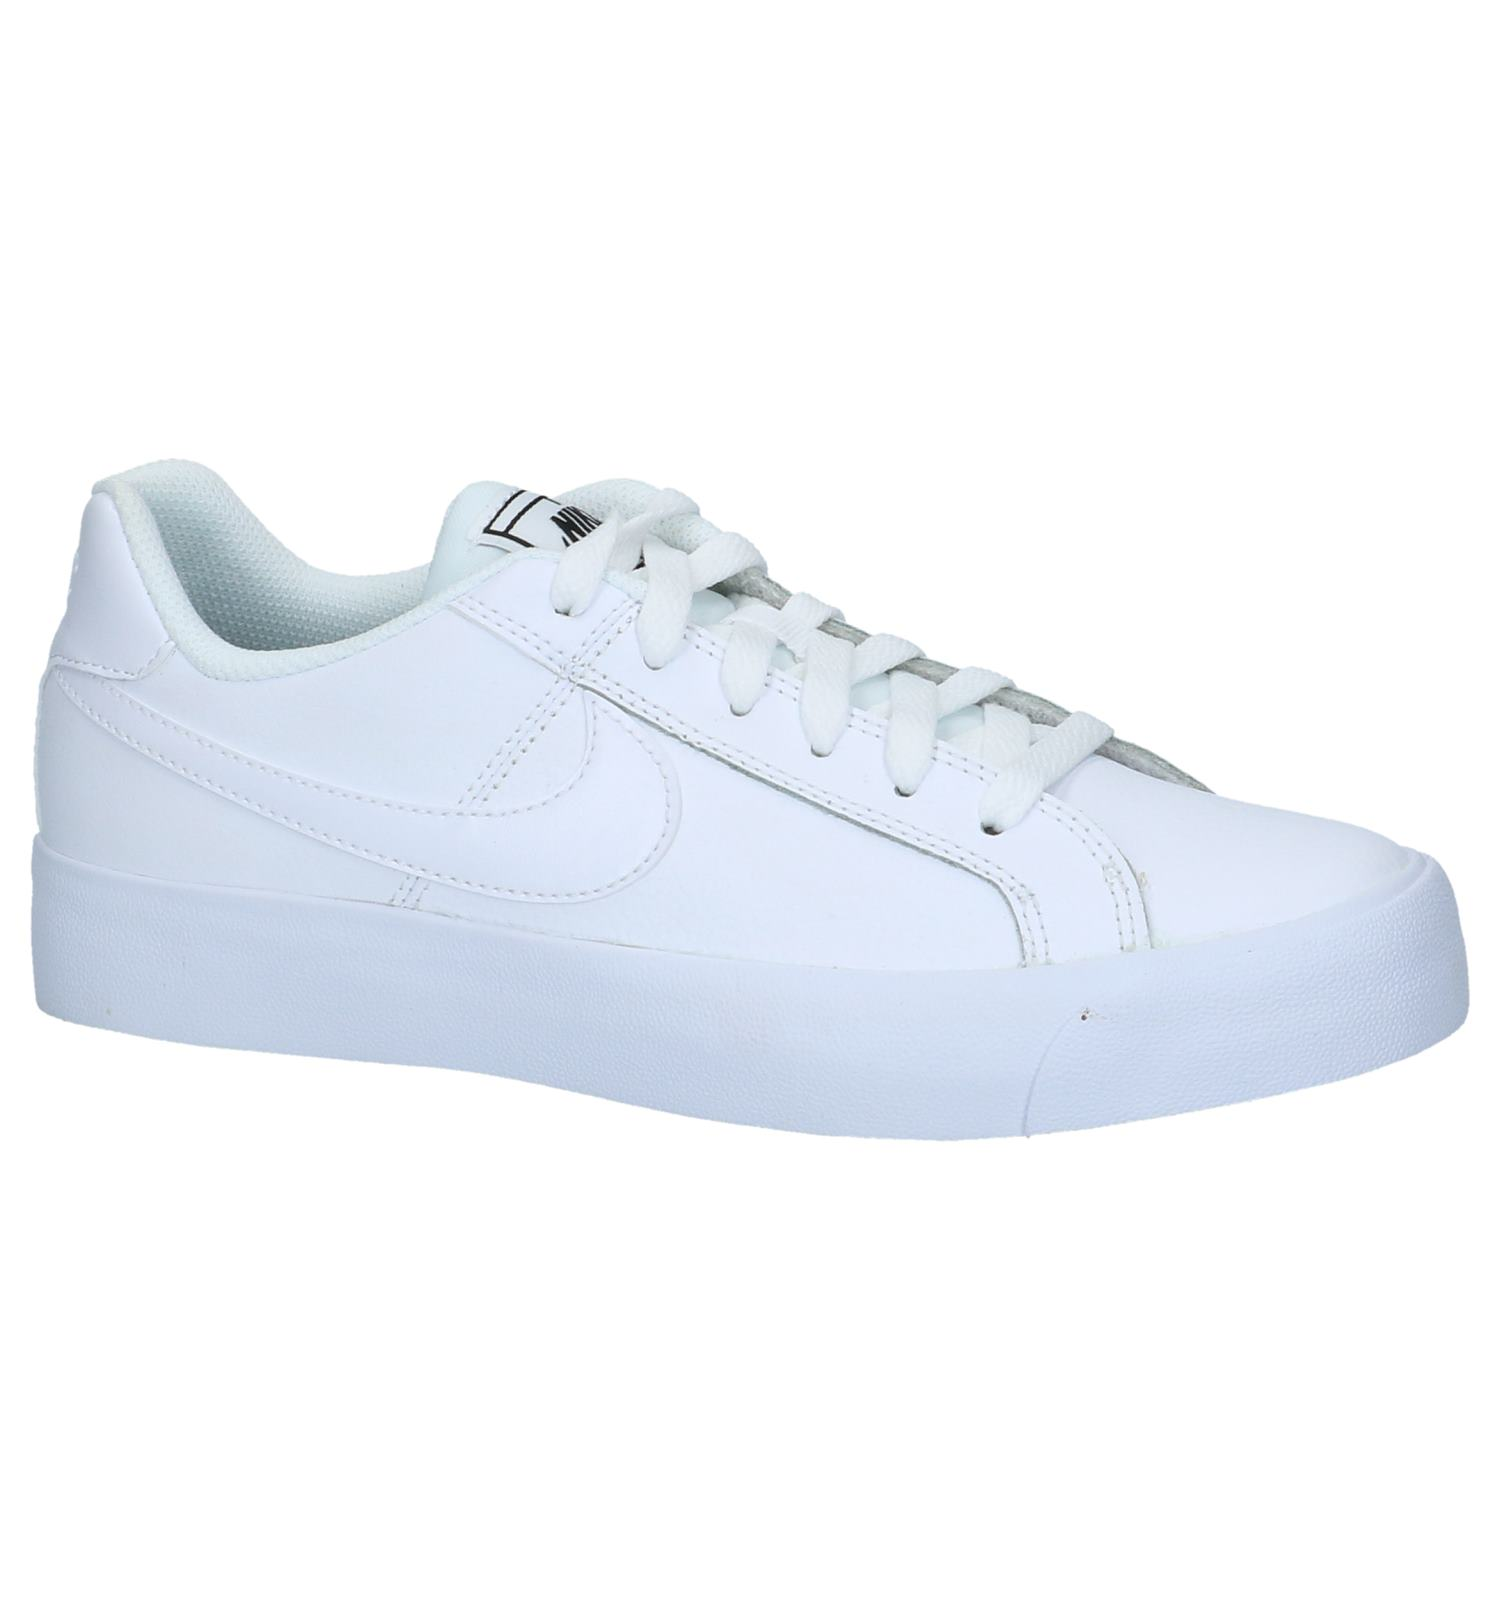 f995acfc86f Sneakers Wit Nike Court Royale | TORFS.BE | Gratis verzend en retour